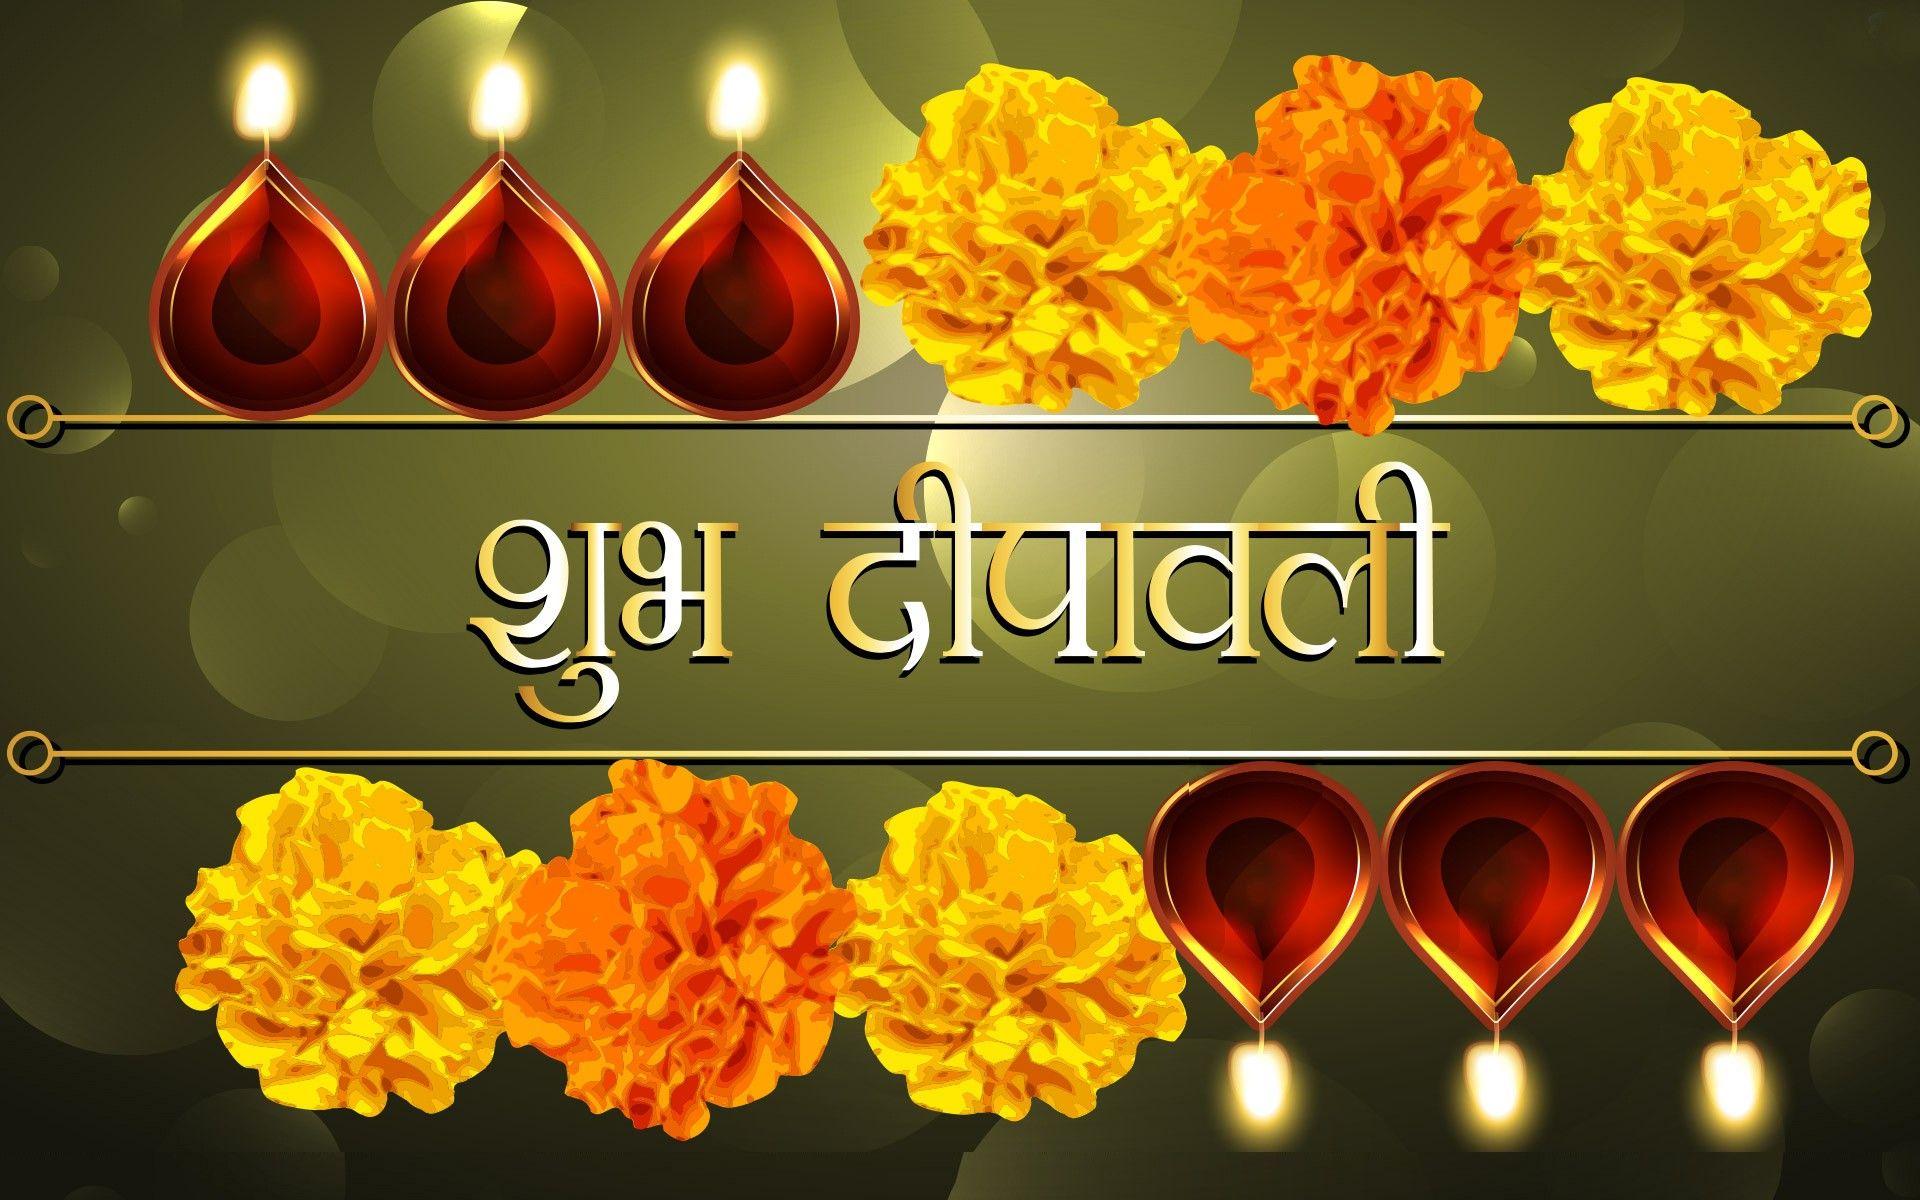 Shubh Deepawali 2015 Download Free Hindi Images http